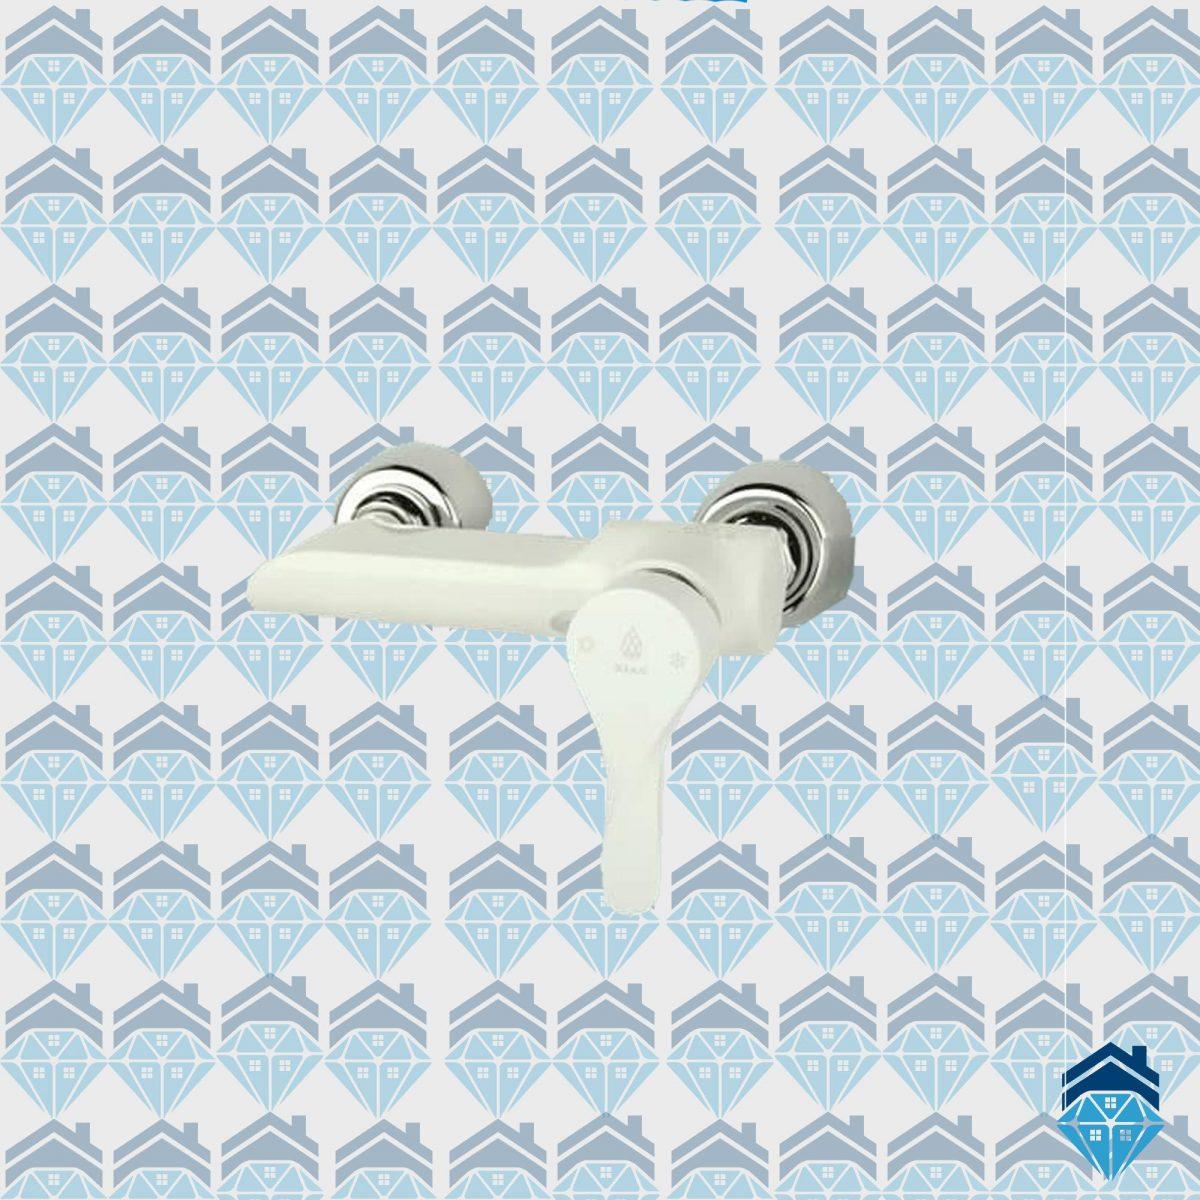 شیر توالت کیان مدل آرنیکا